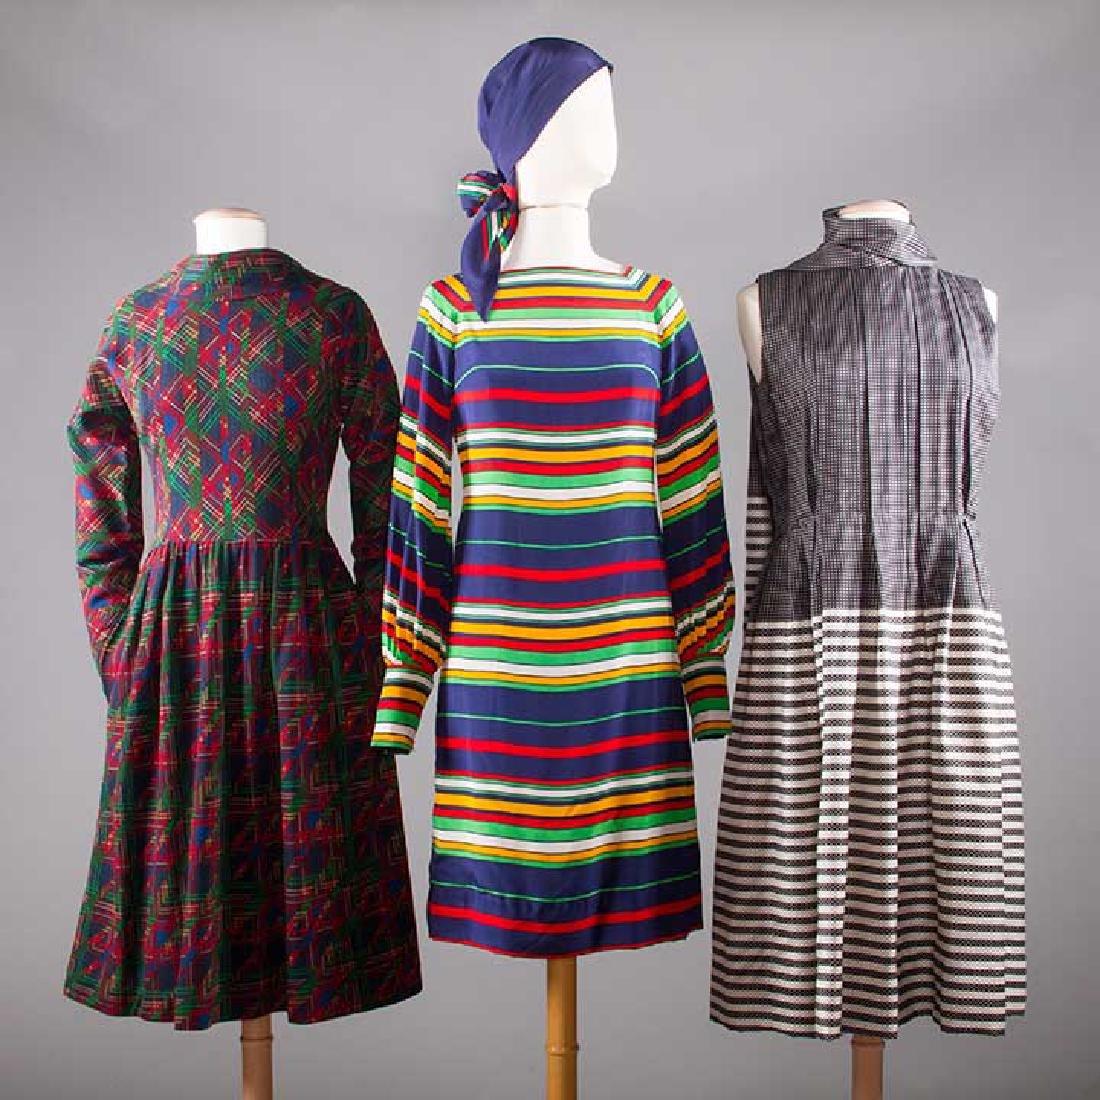 THREE PAULINE TRIGERE DRESSES, 1970s